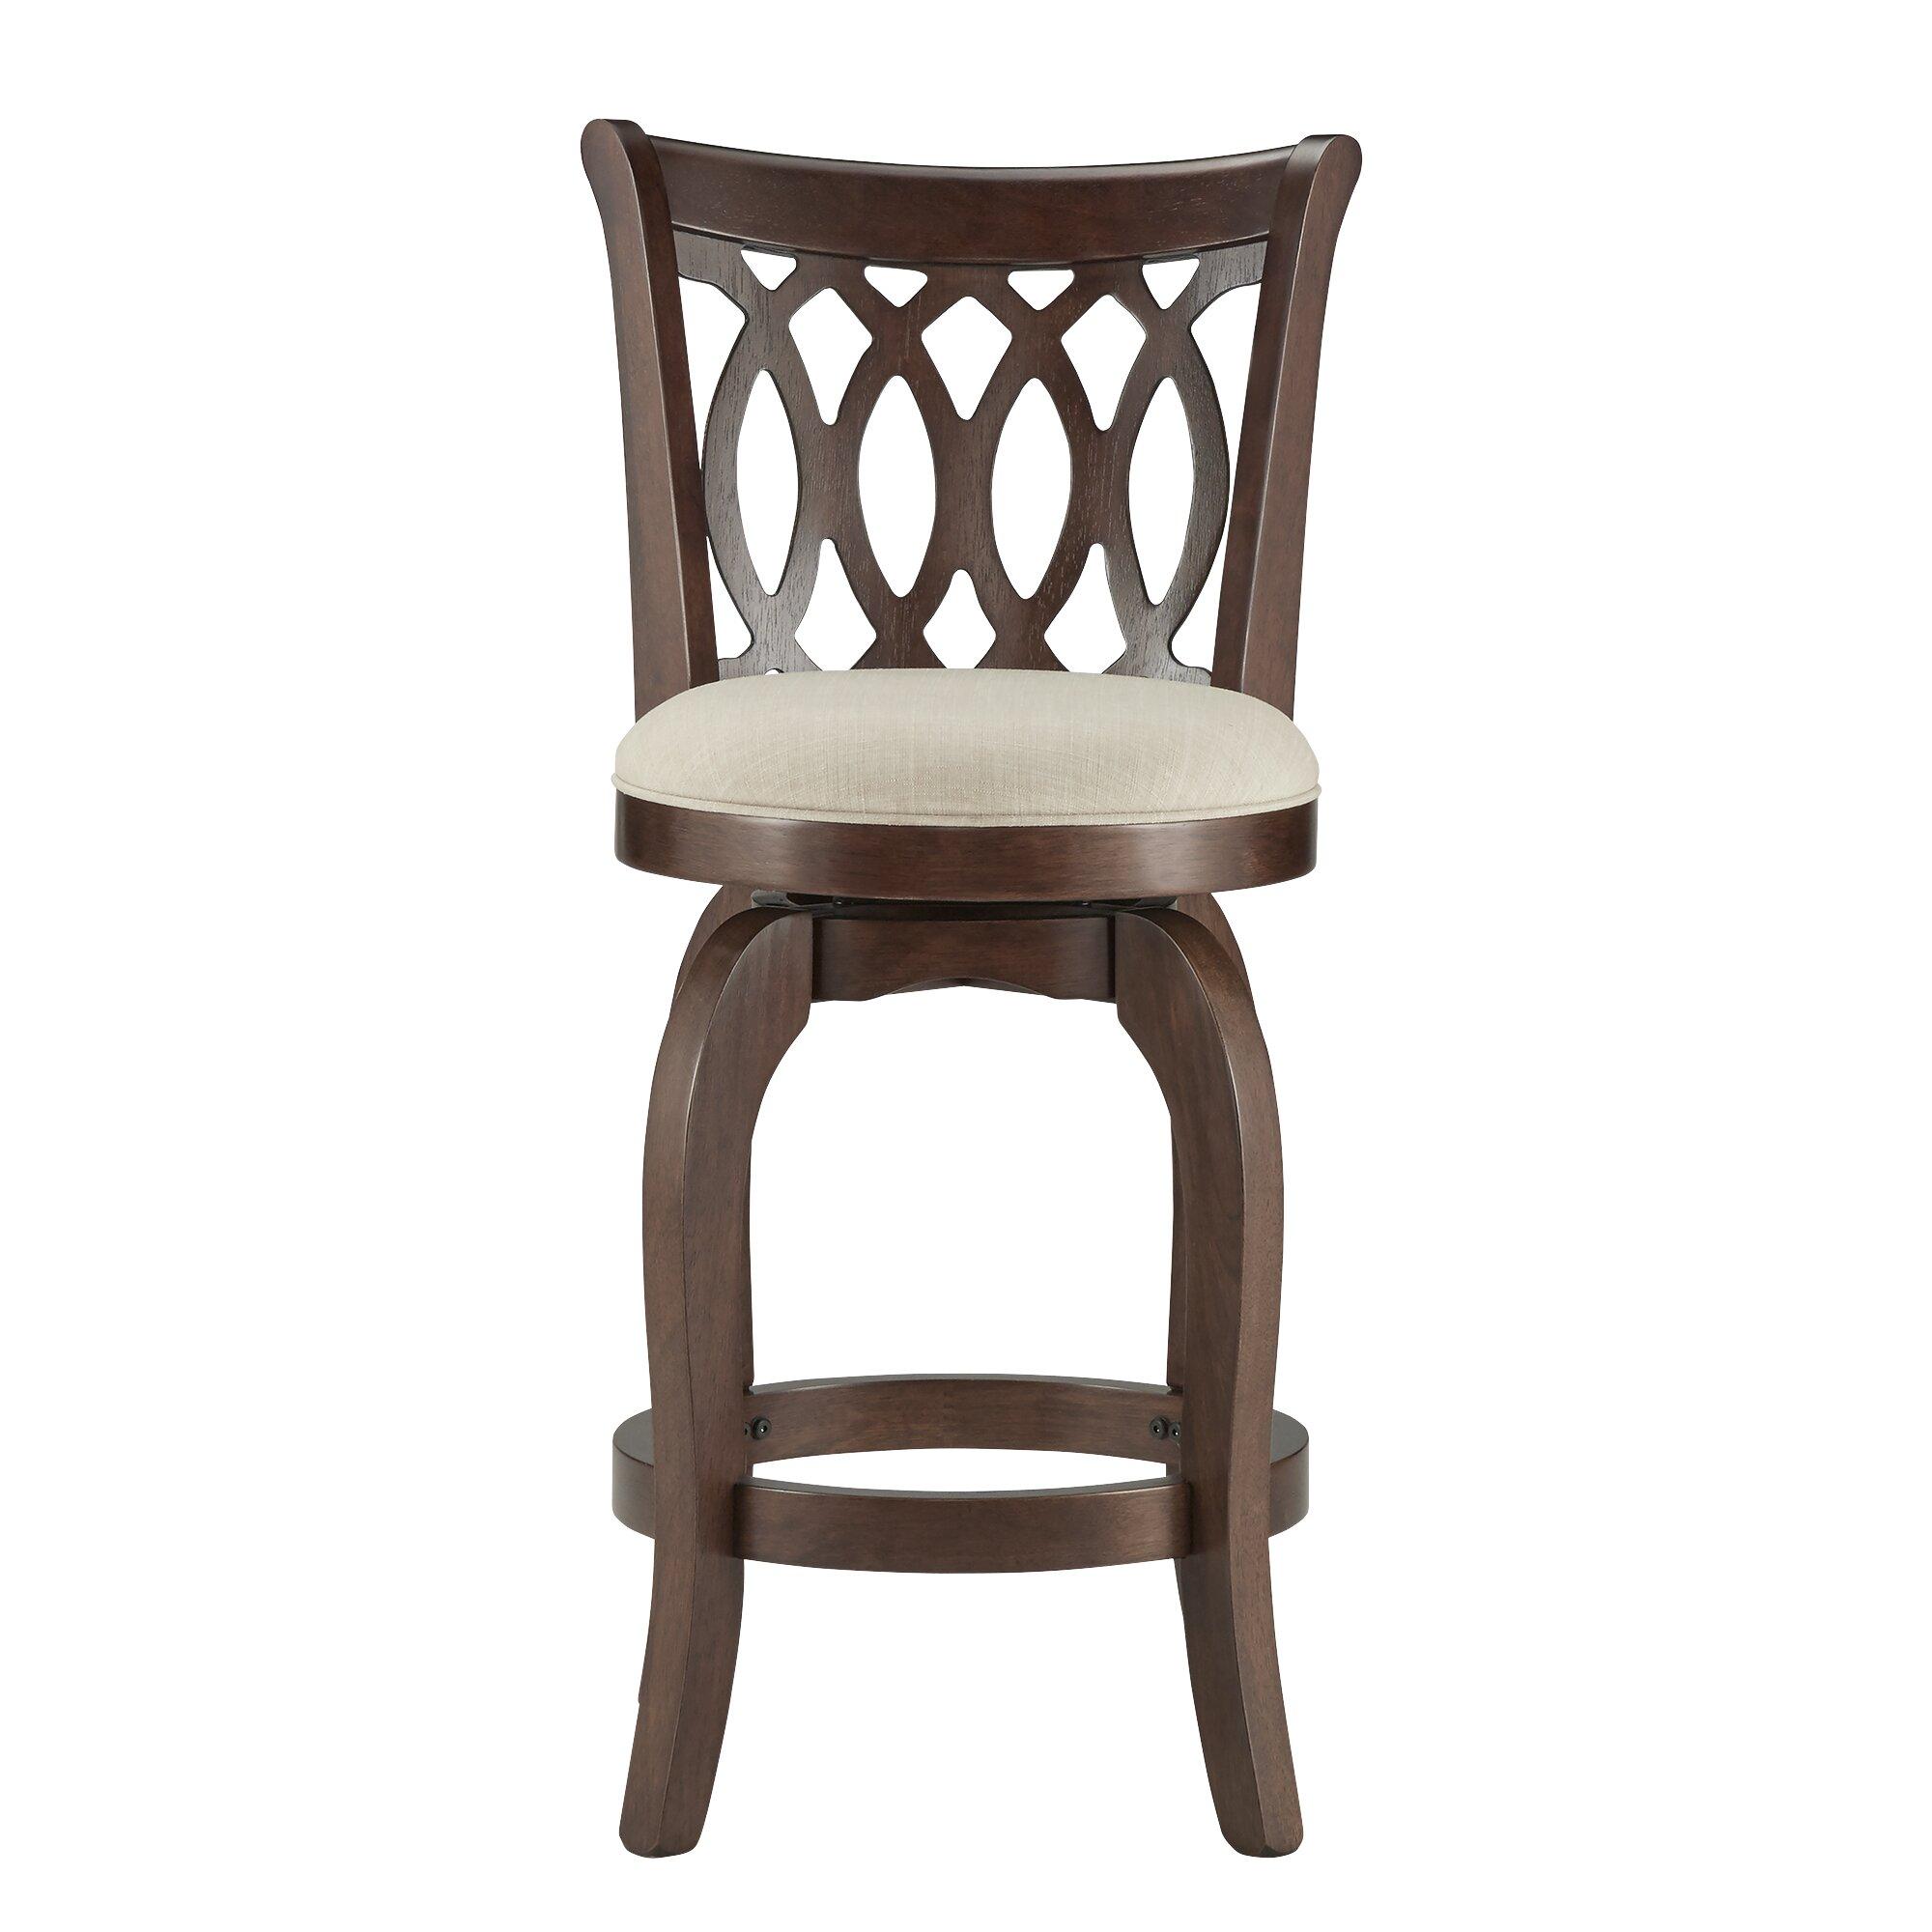 24 swivel bar stools 28 images poundex bobkona earline  : Three Posts Heartwood 24 Swivel Bar Stool from wallpapersist.com size 2000 x 2000 jpeg 261kB